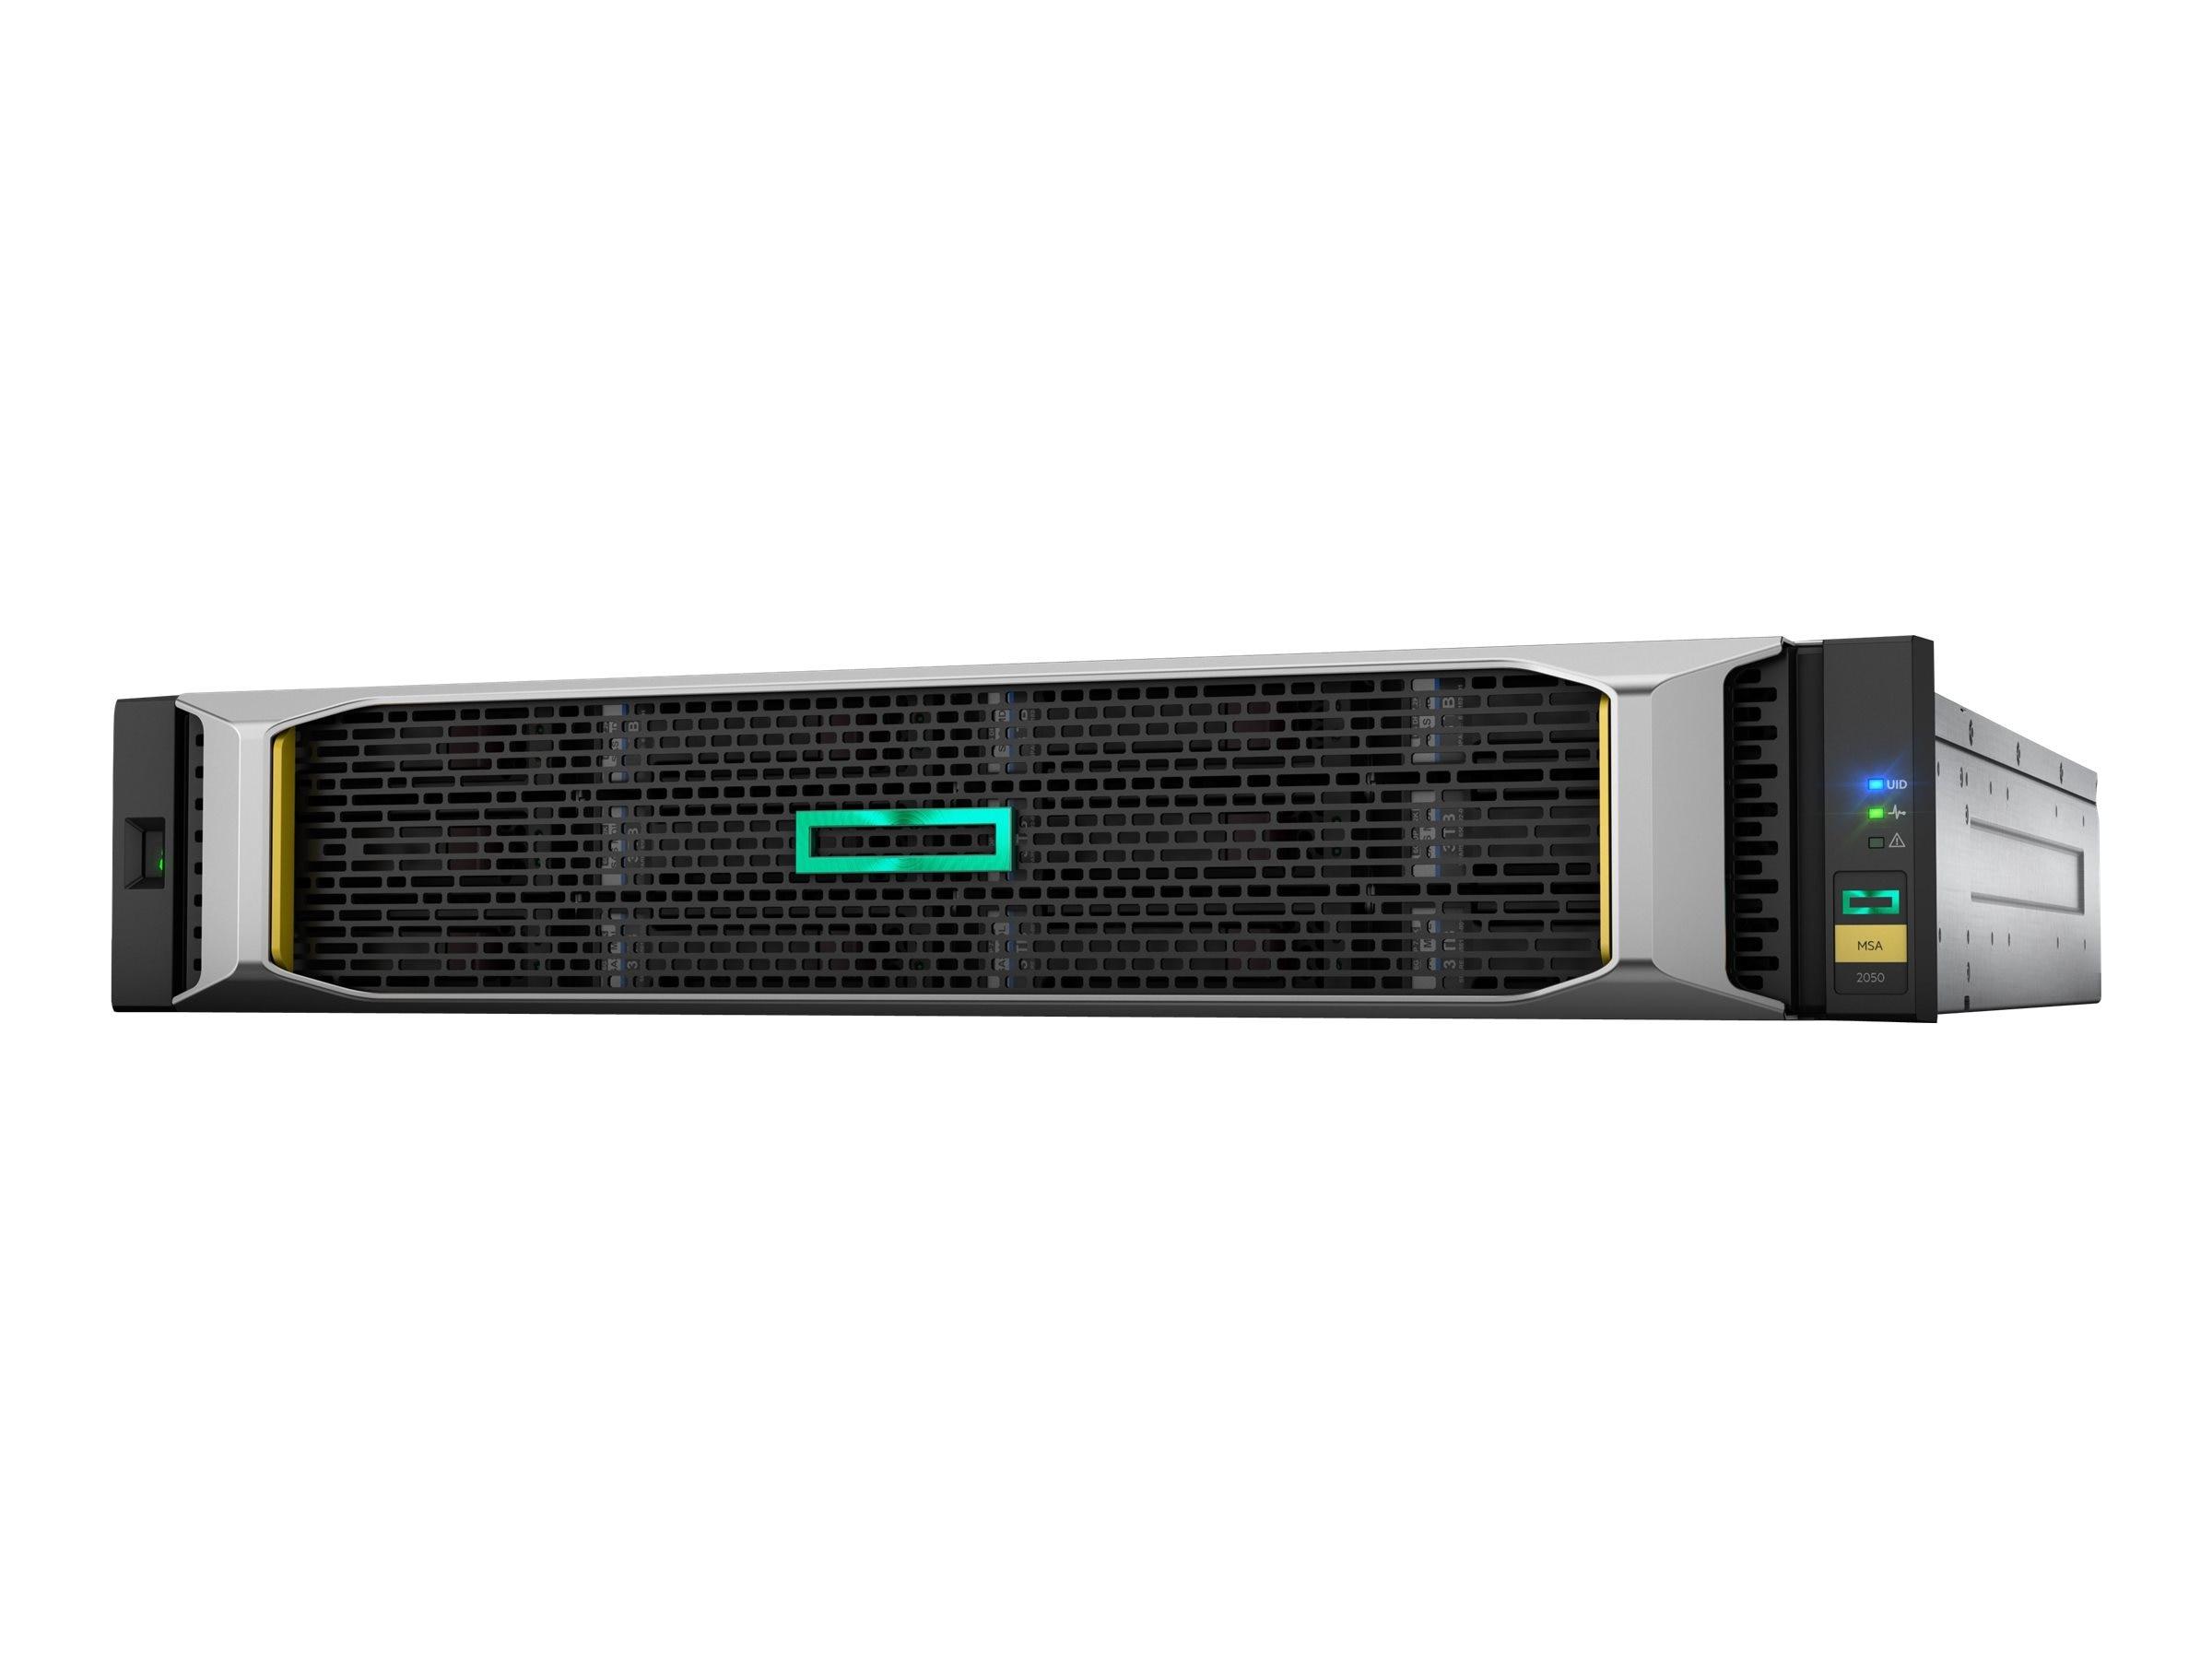 HPE MSA 1050 SAS 12Gb s Dual Controller LFF Storage